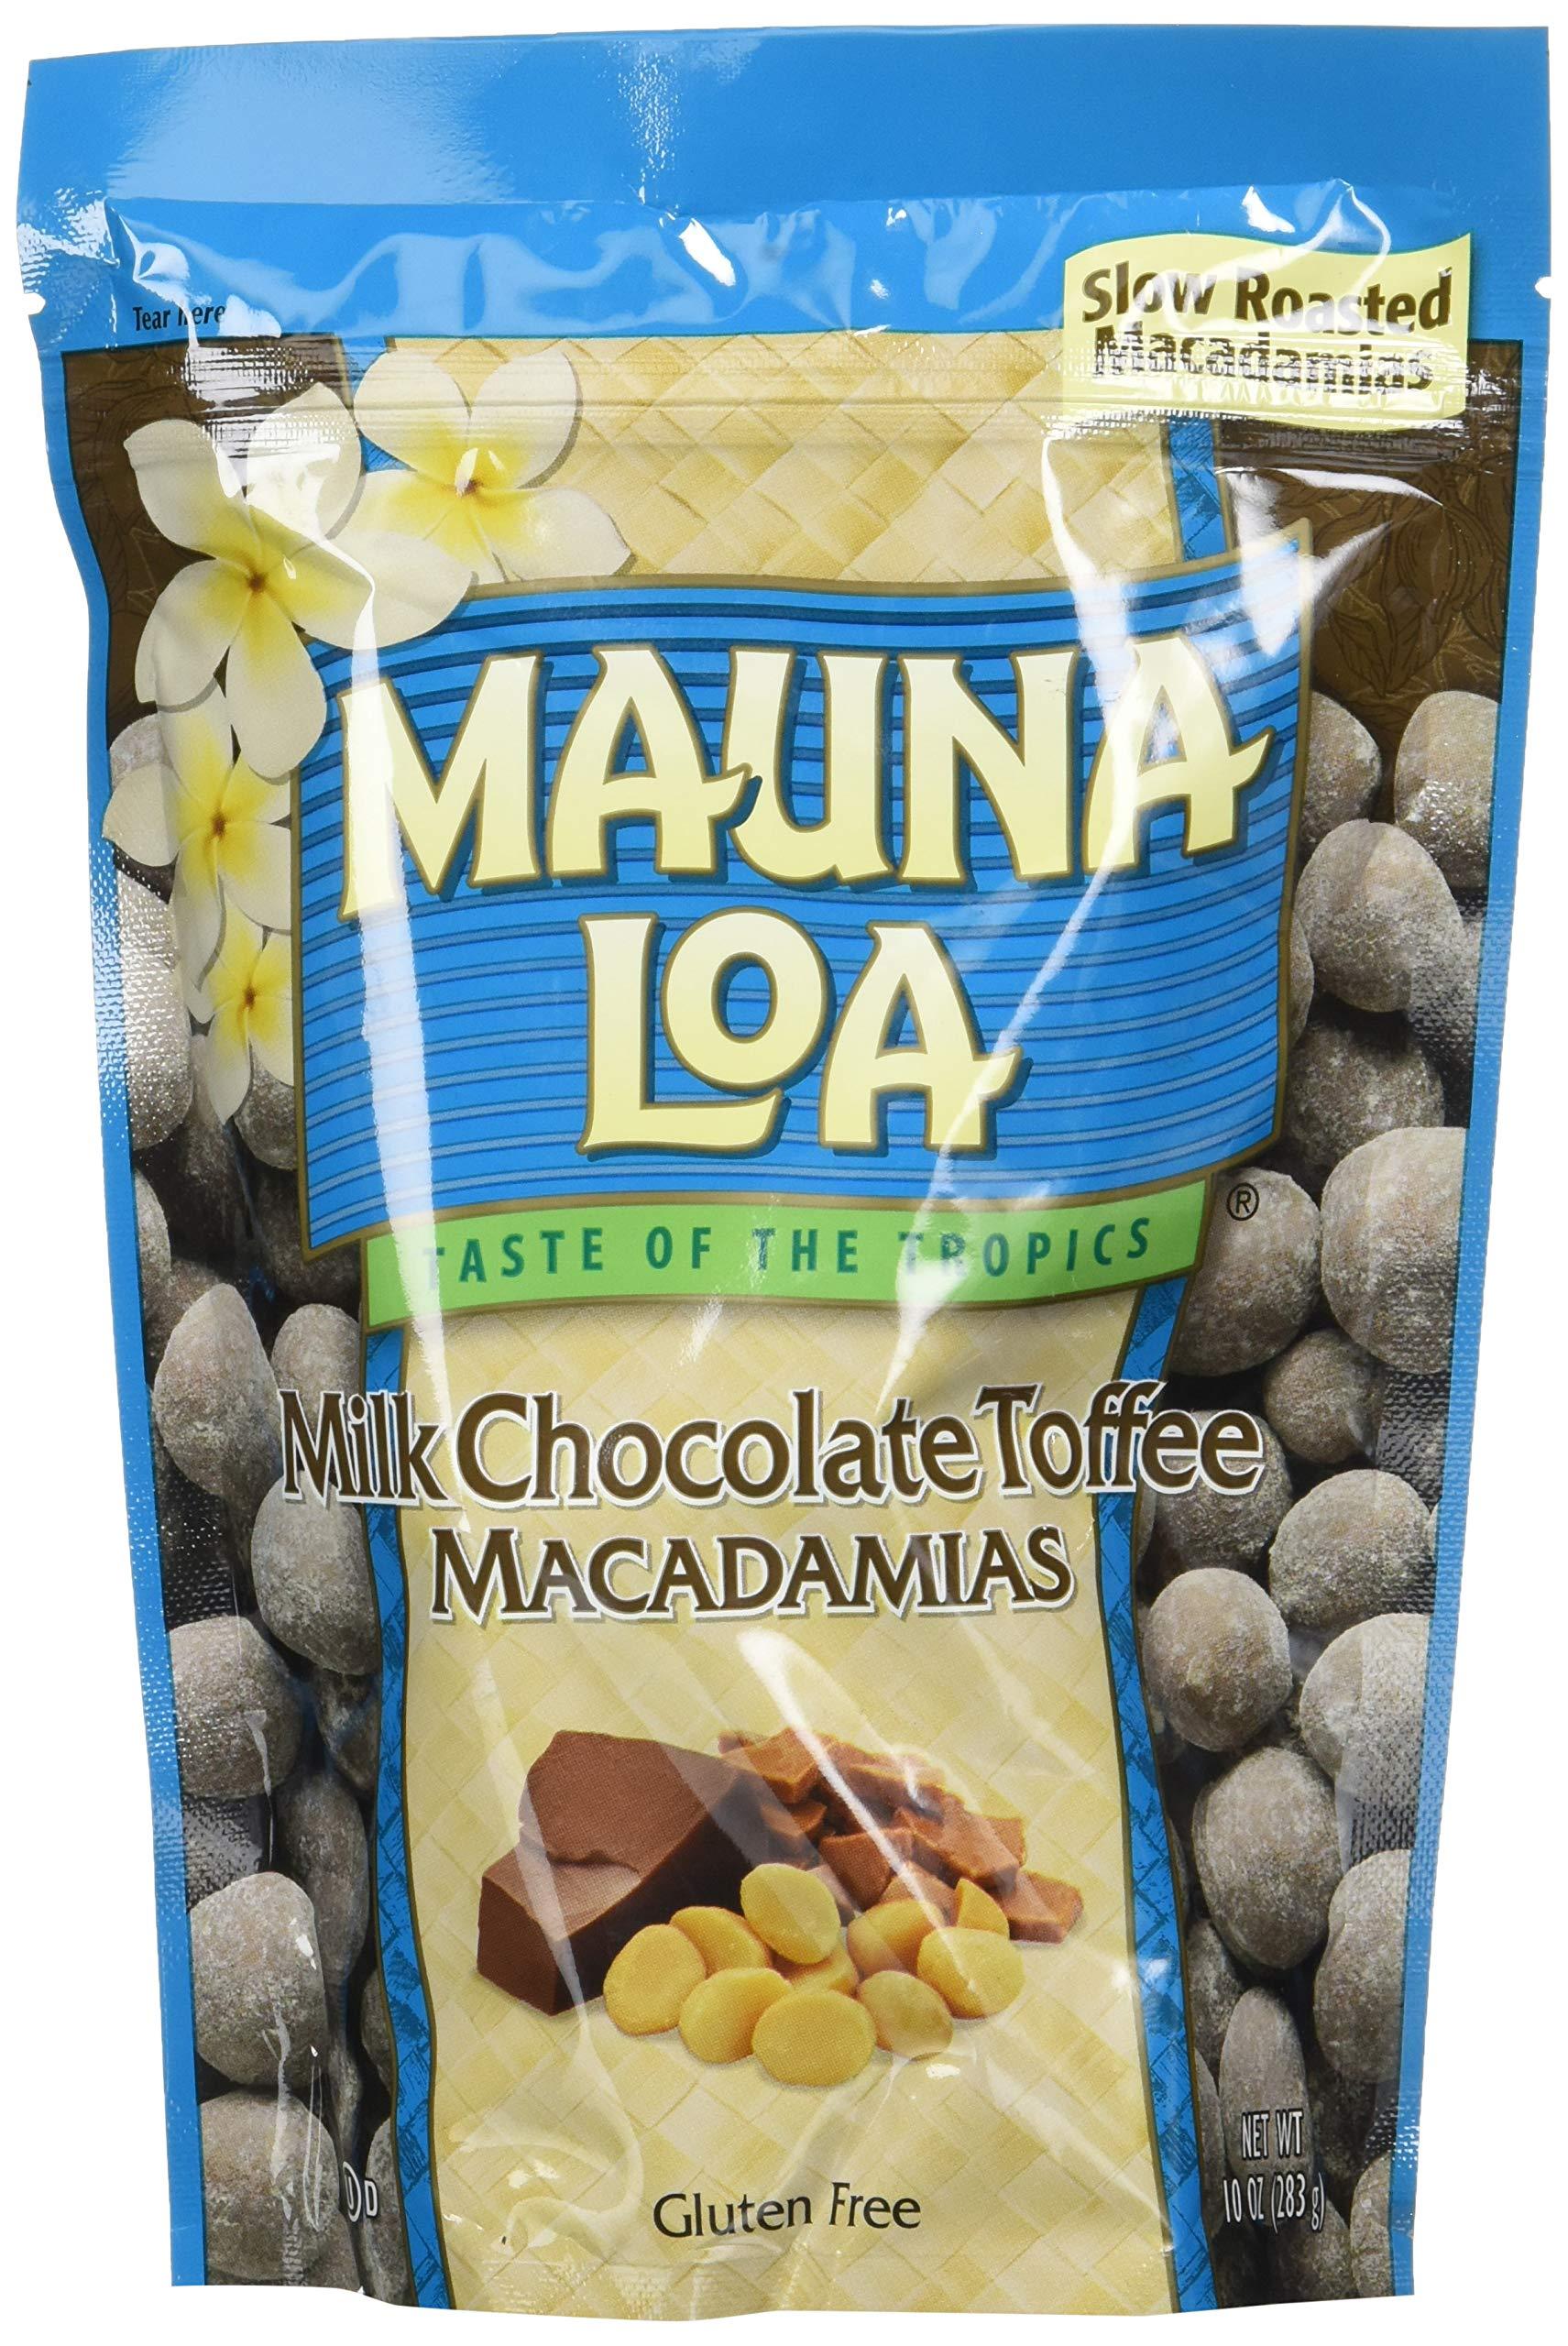 Mauna Loa Macadamias, Milk Chocolate Toffee, 10 Ounce